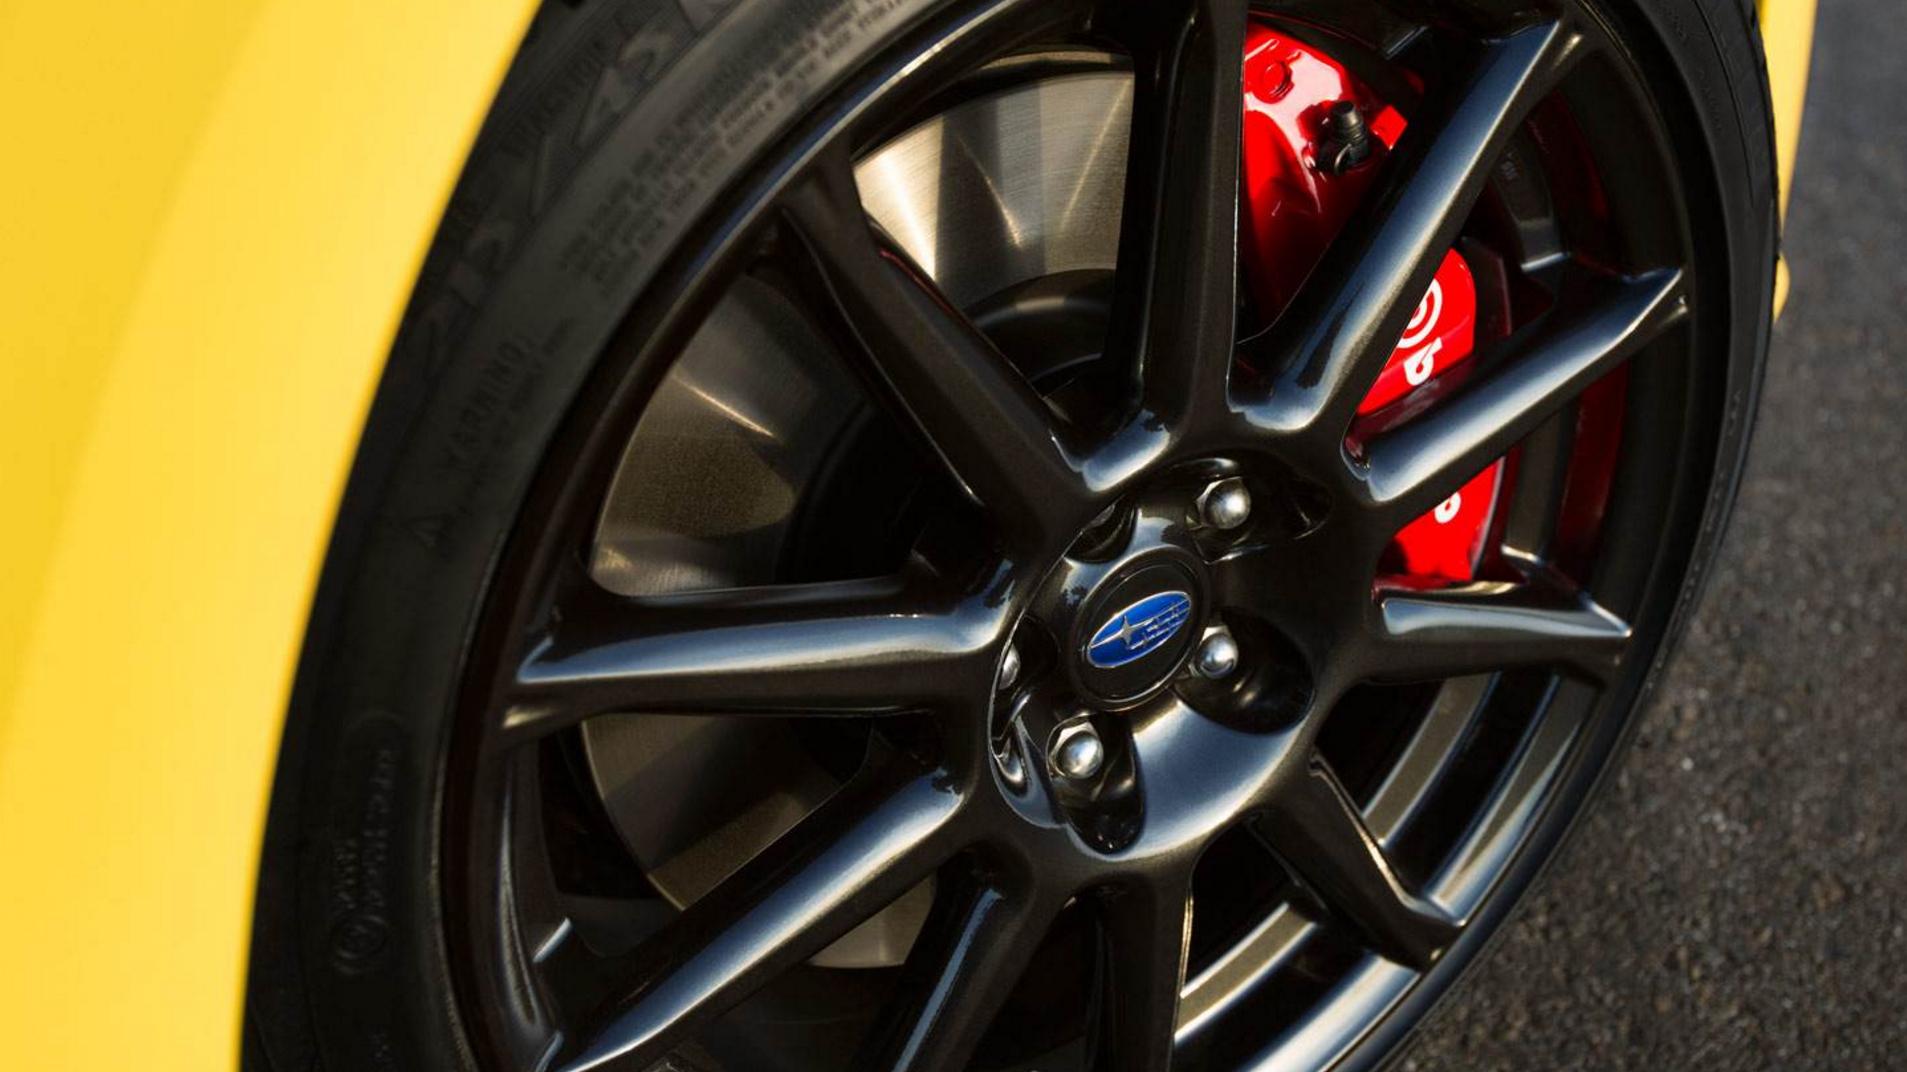 2017 Subaru BRZ Series.Yellow alloy rim